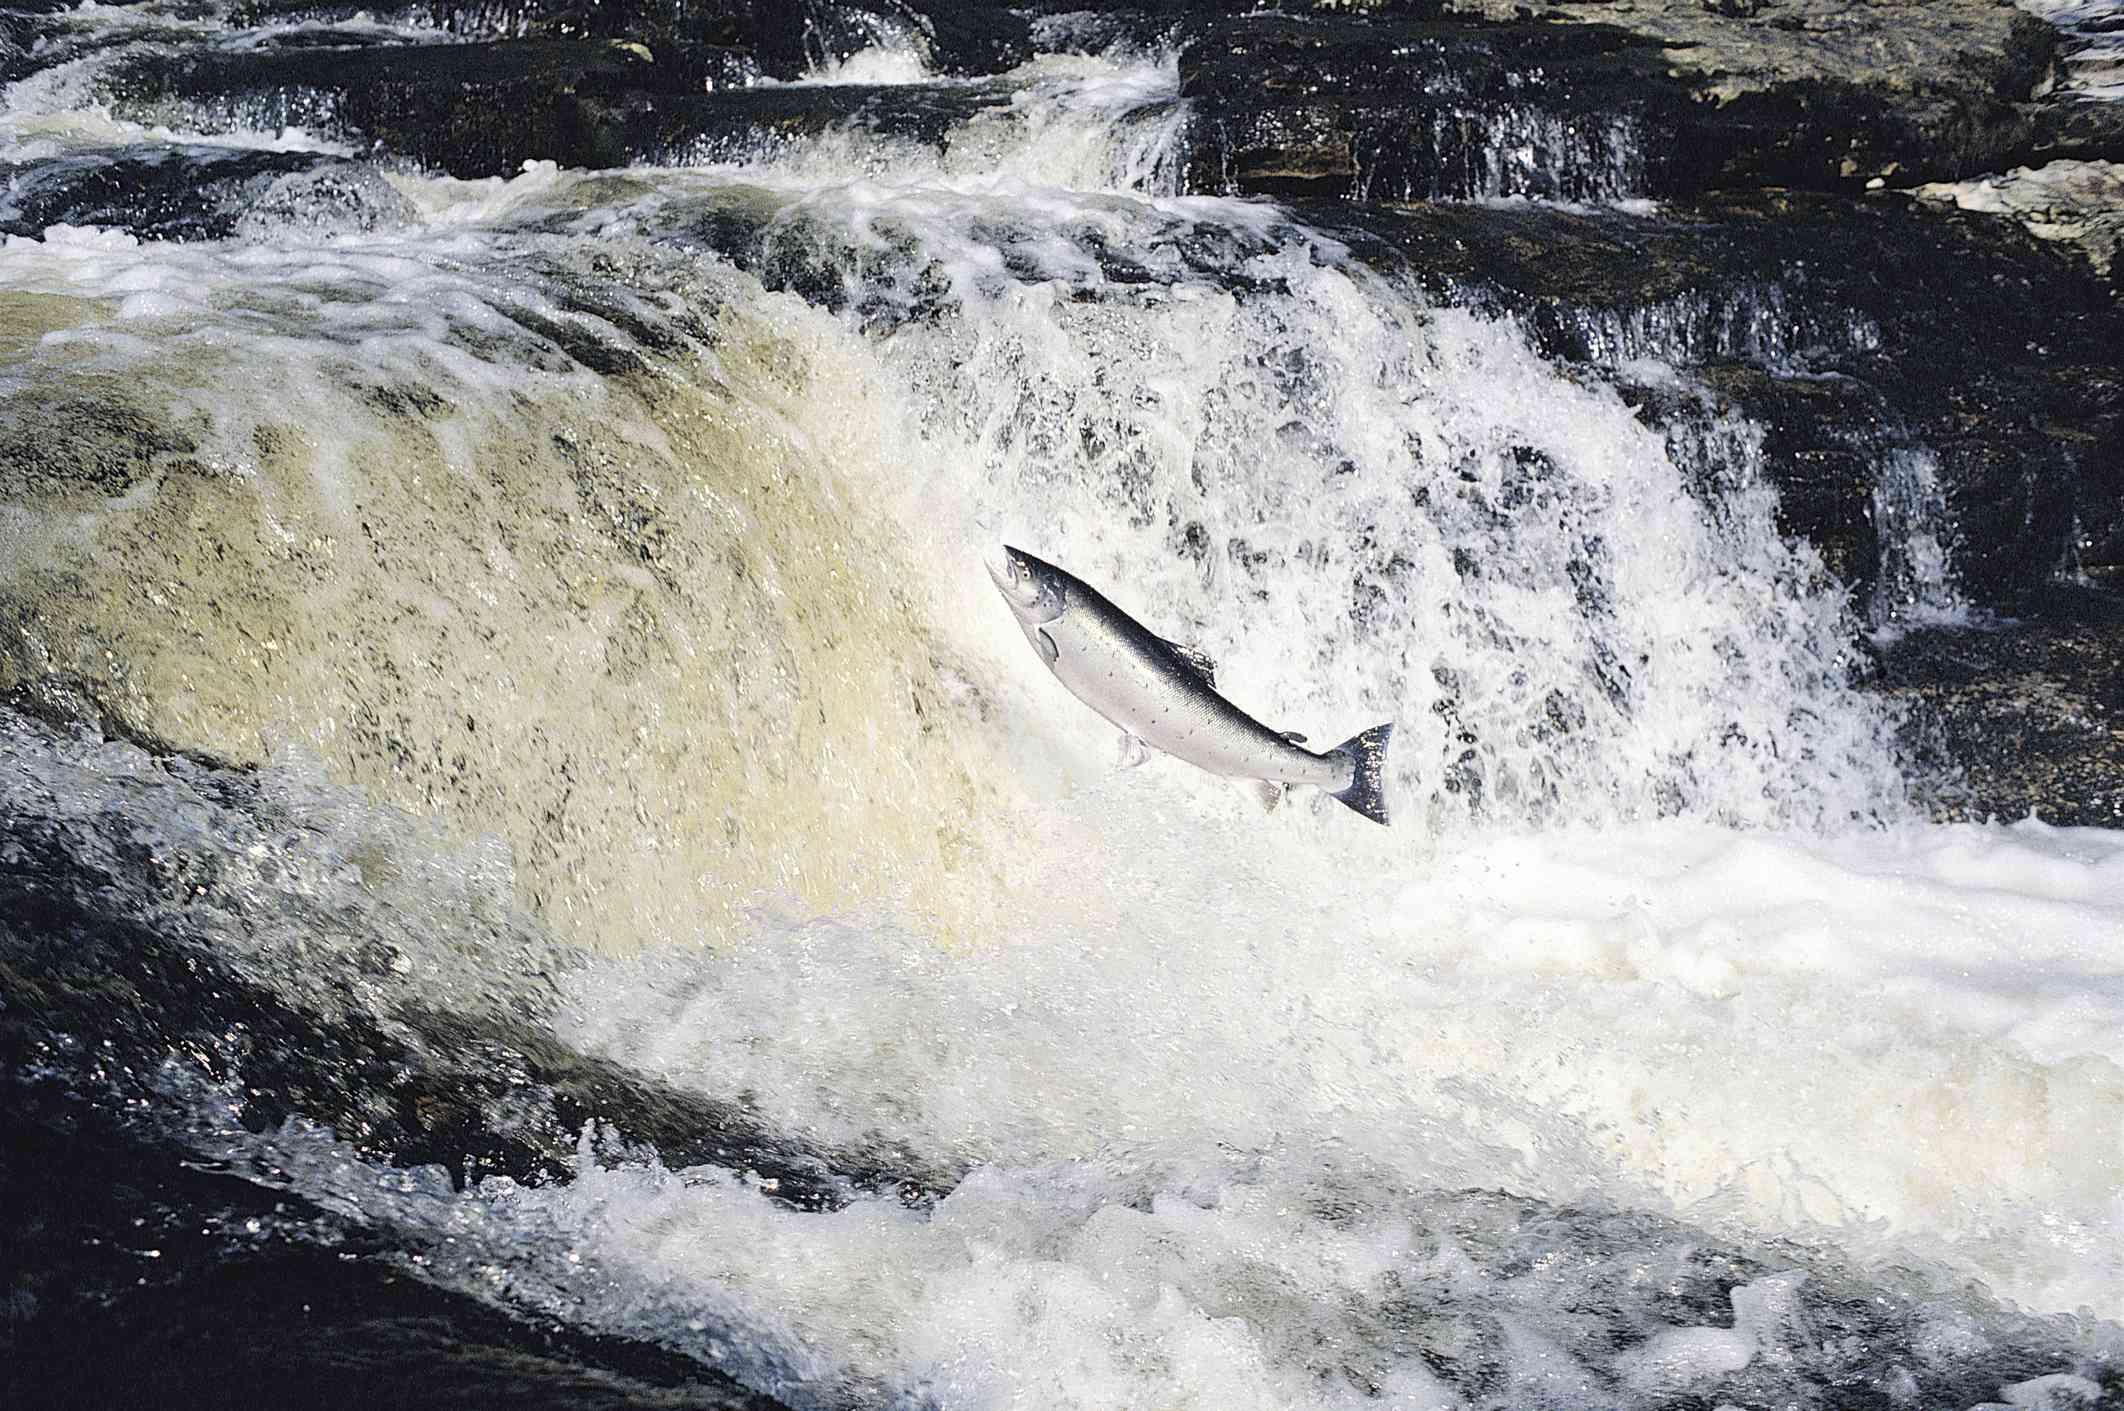 Salmon leaping upstream, UK